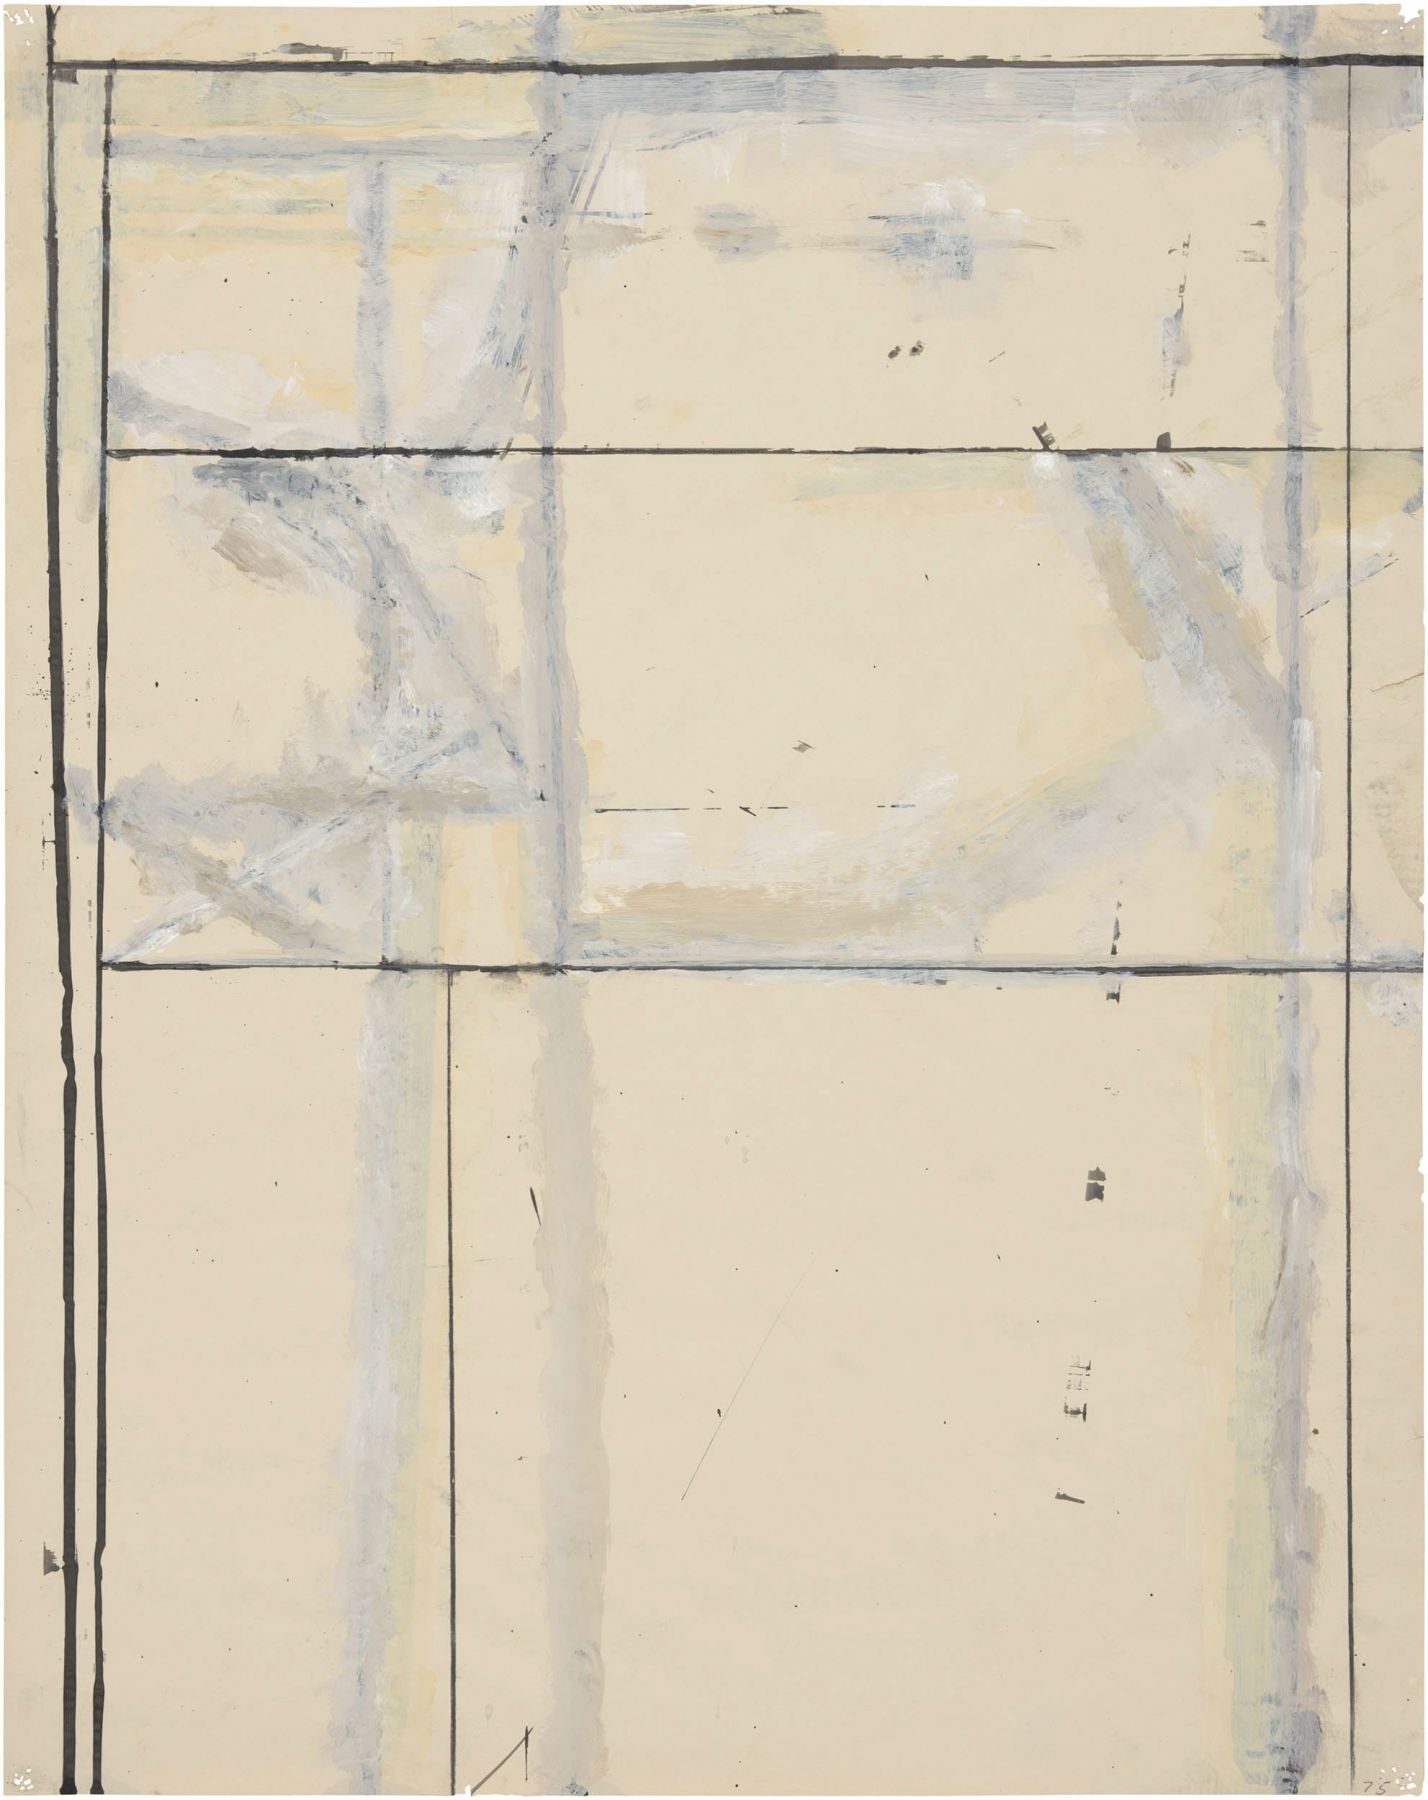 Untitled (CR no. 4181), 1975